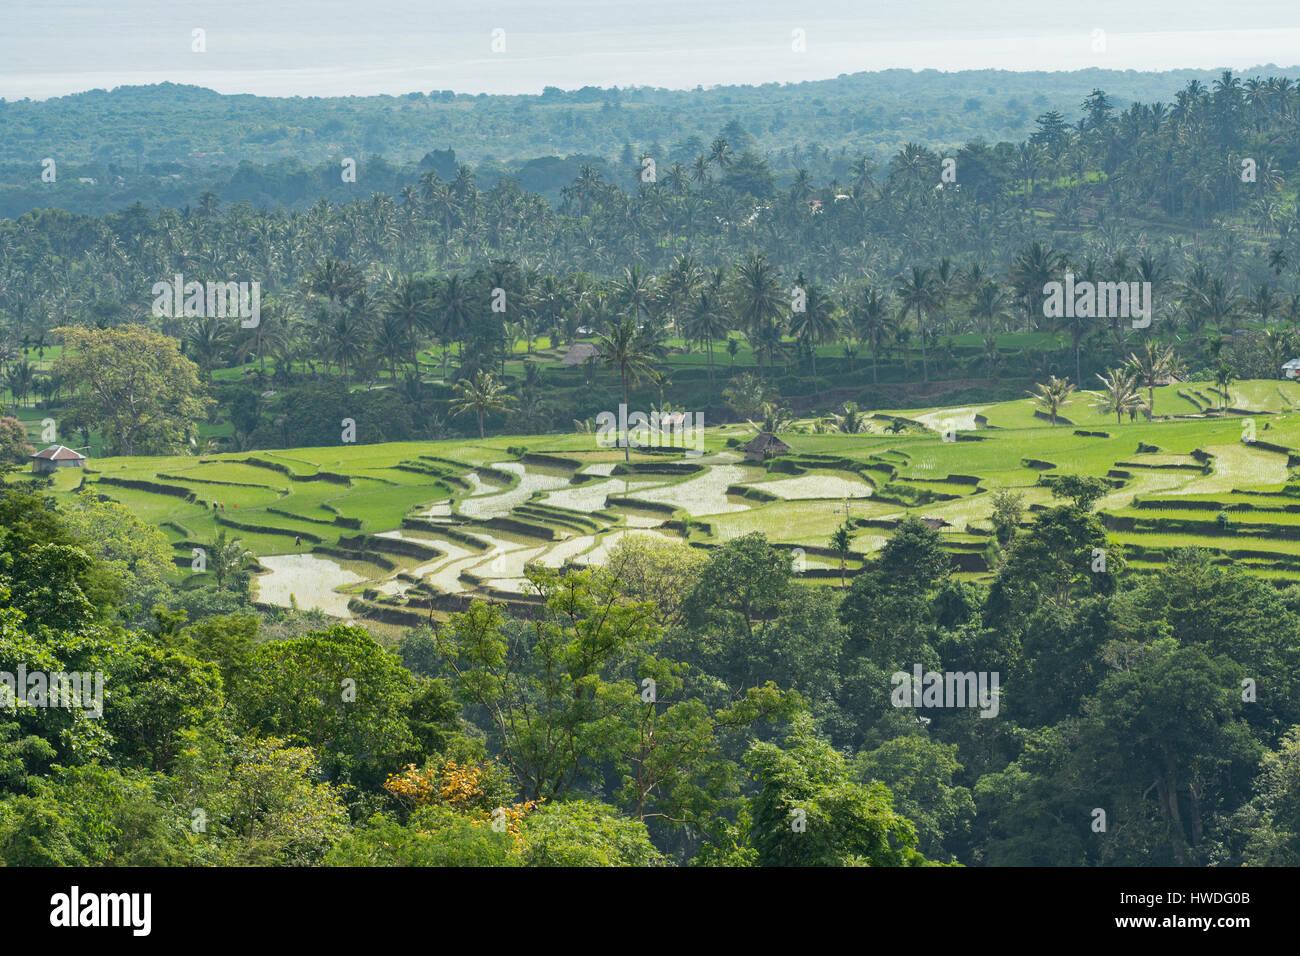 Reisfelder in der Nähe von Senaru, Lombok, Indonesien Stockbild